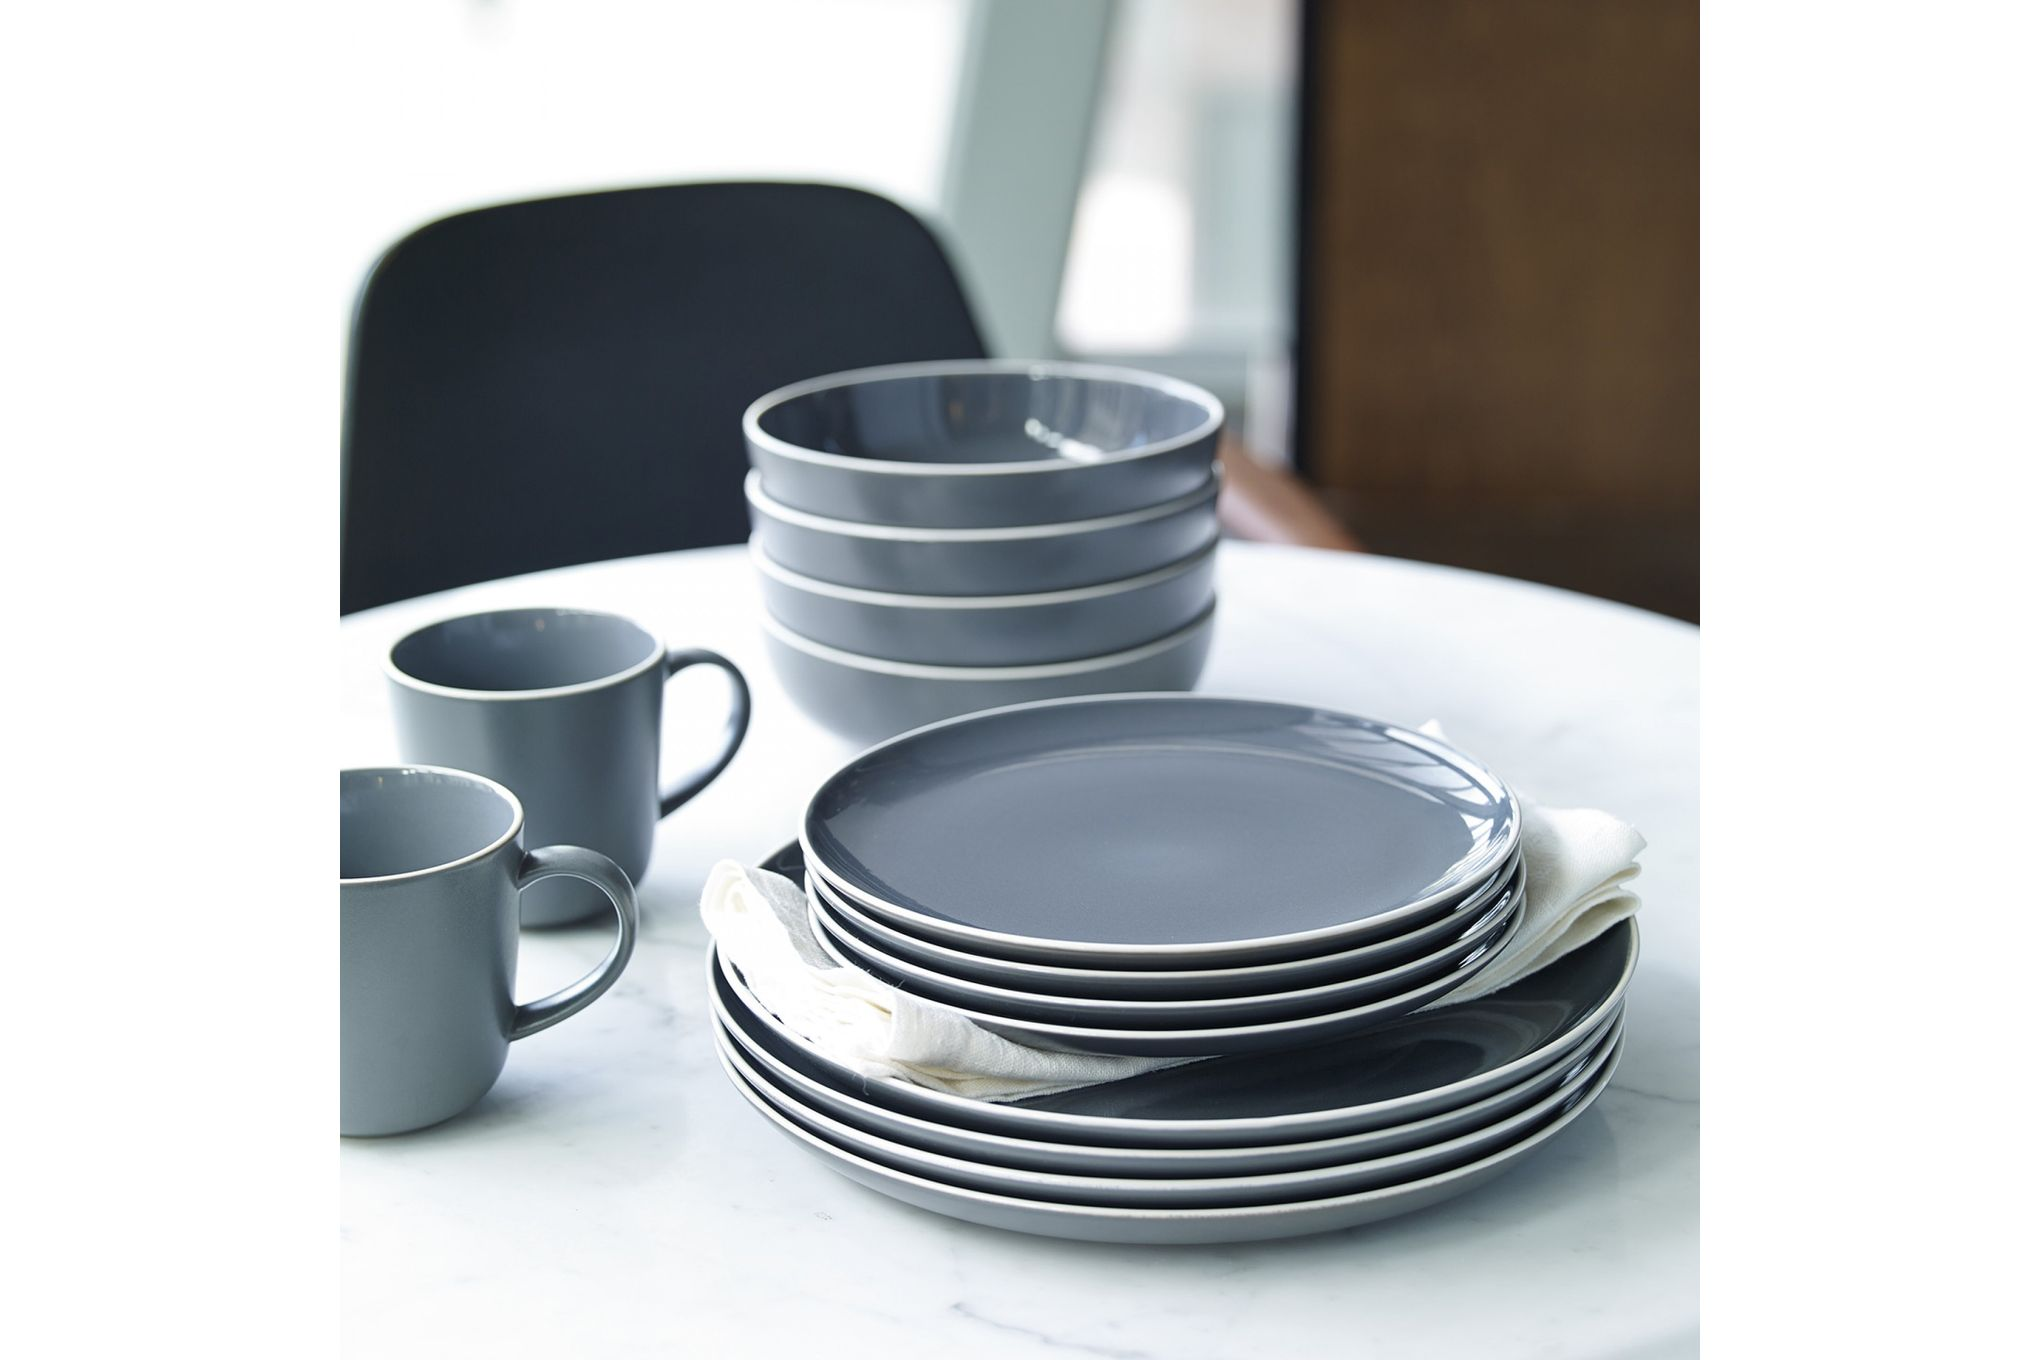 Gordon Ramsay for Royal Doulton Bread Street Slate 16 Piece Set 4 x Plate 28cm, Plate 22cm, Bowl 18cm, Mug thumb 2